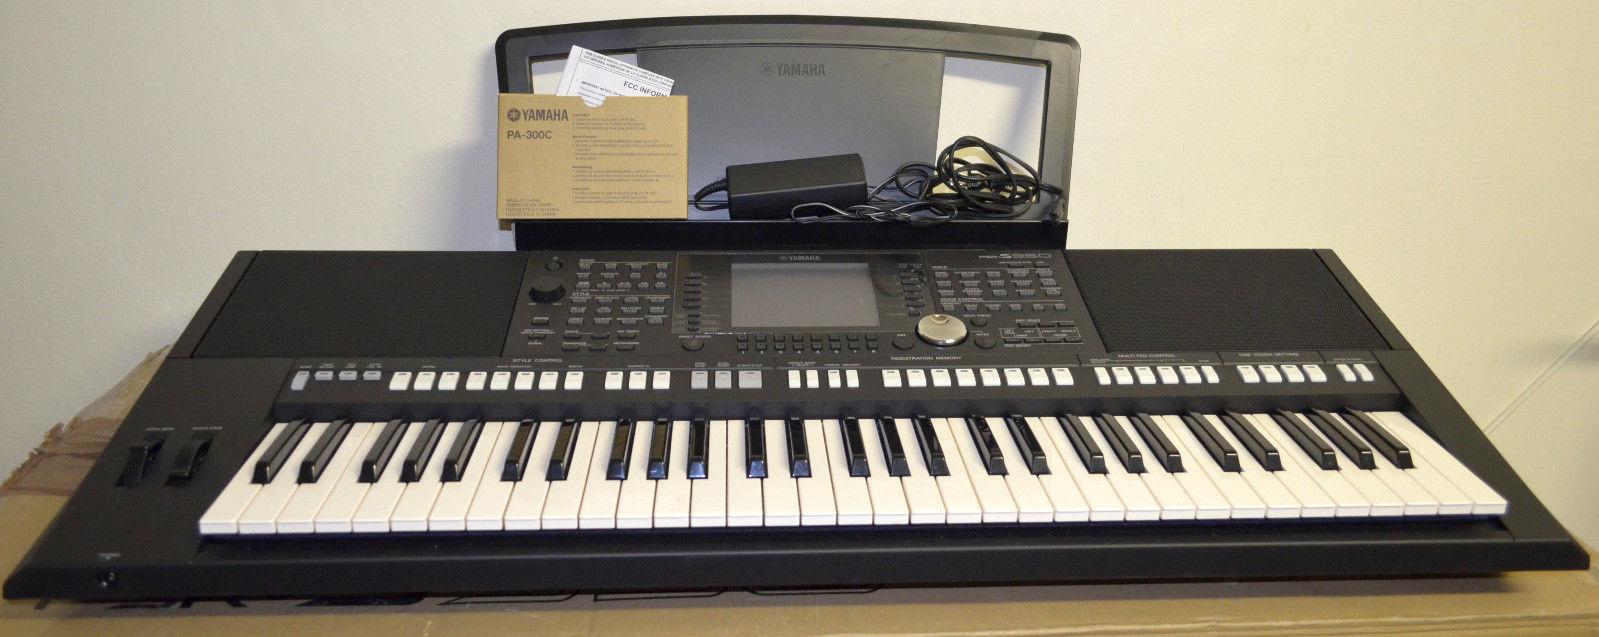 Yamaha 950 for sale classifieds for Yamaha psr s950 for sale